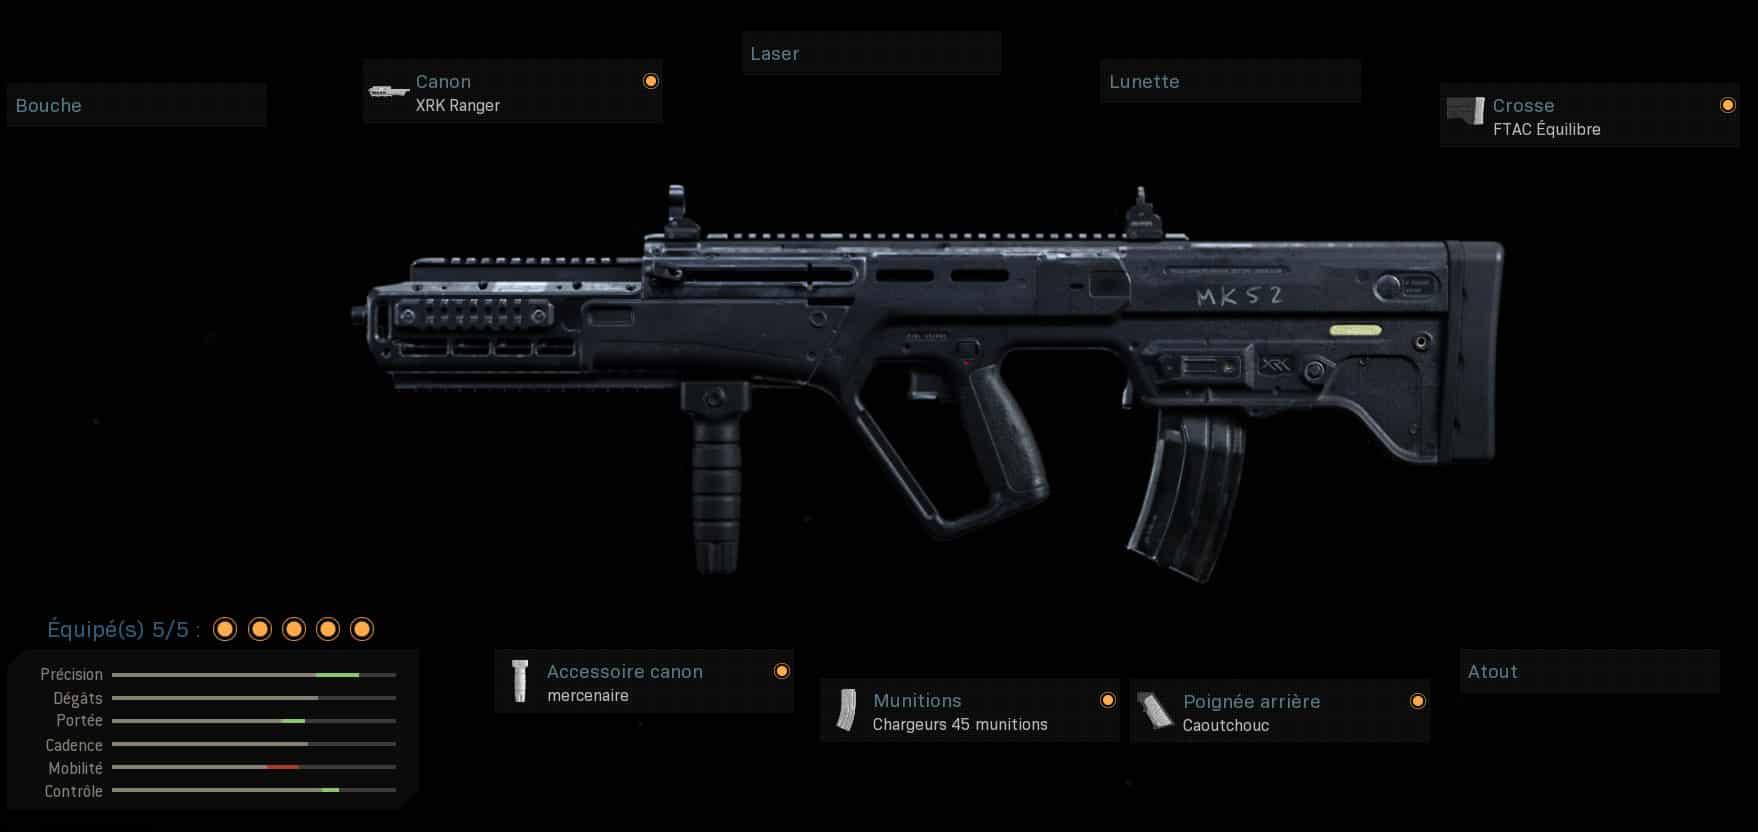 cod-call-of-duty-modern-warfare-RAM-7-meilleurs-loadout-attachments-mod-2